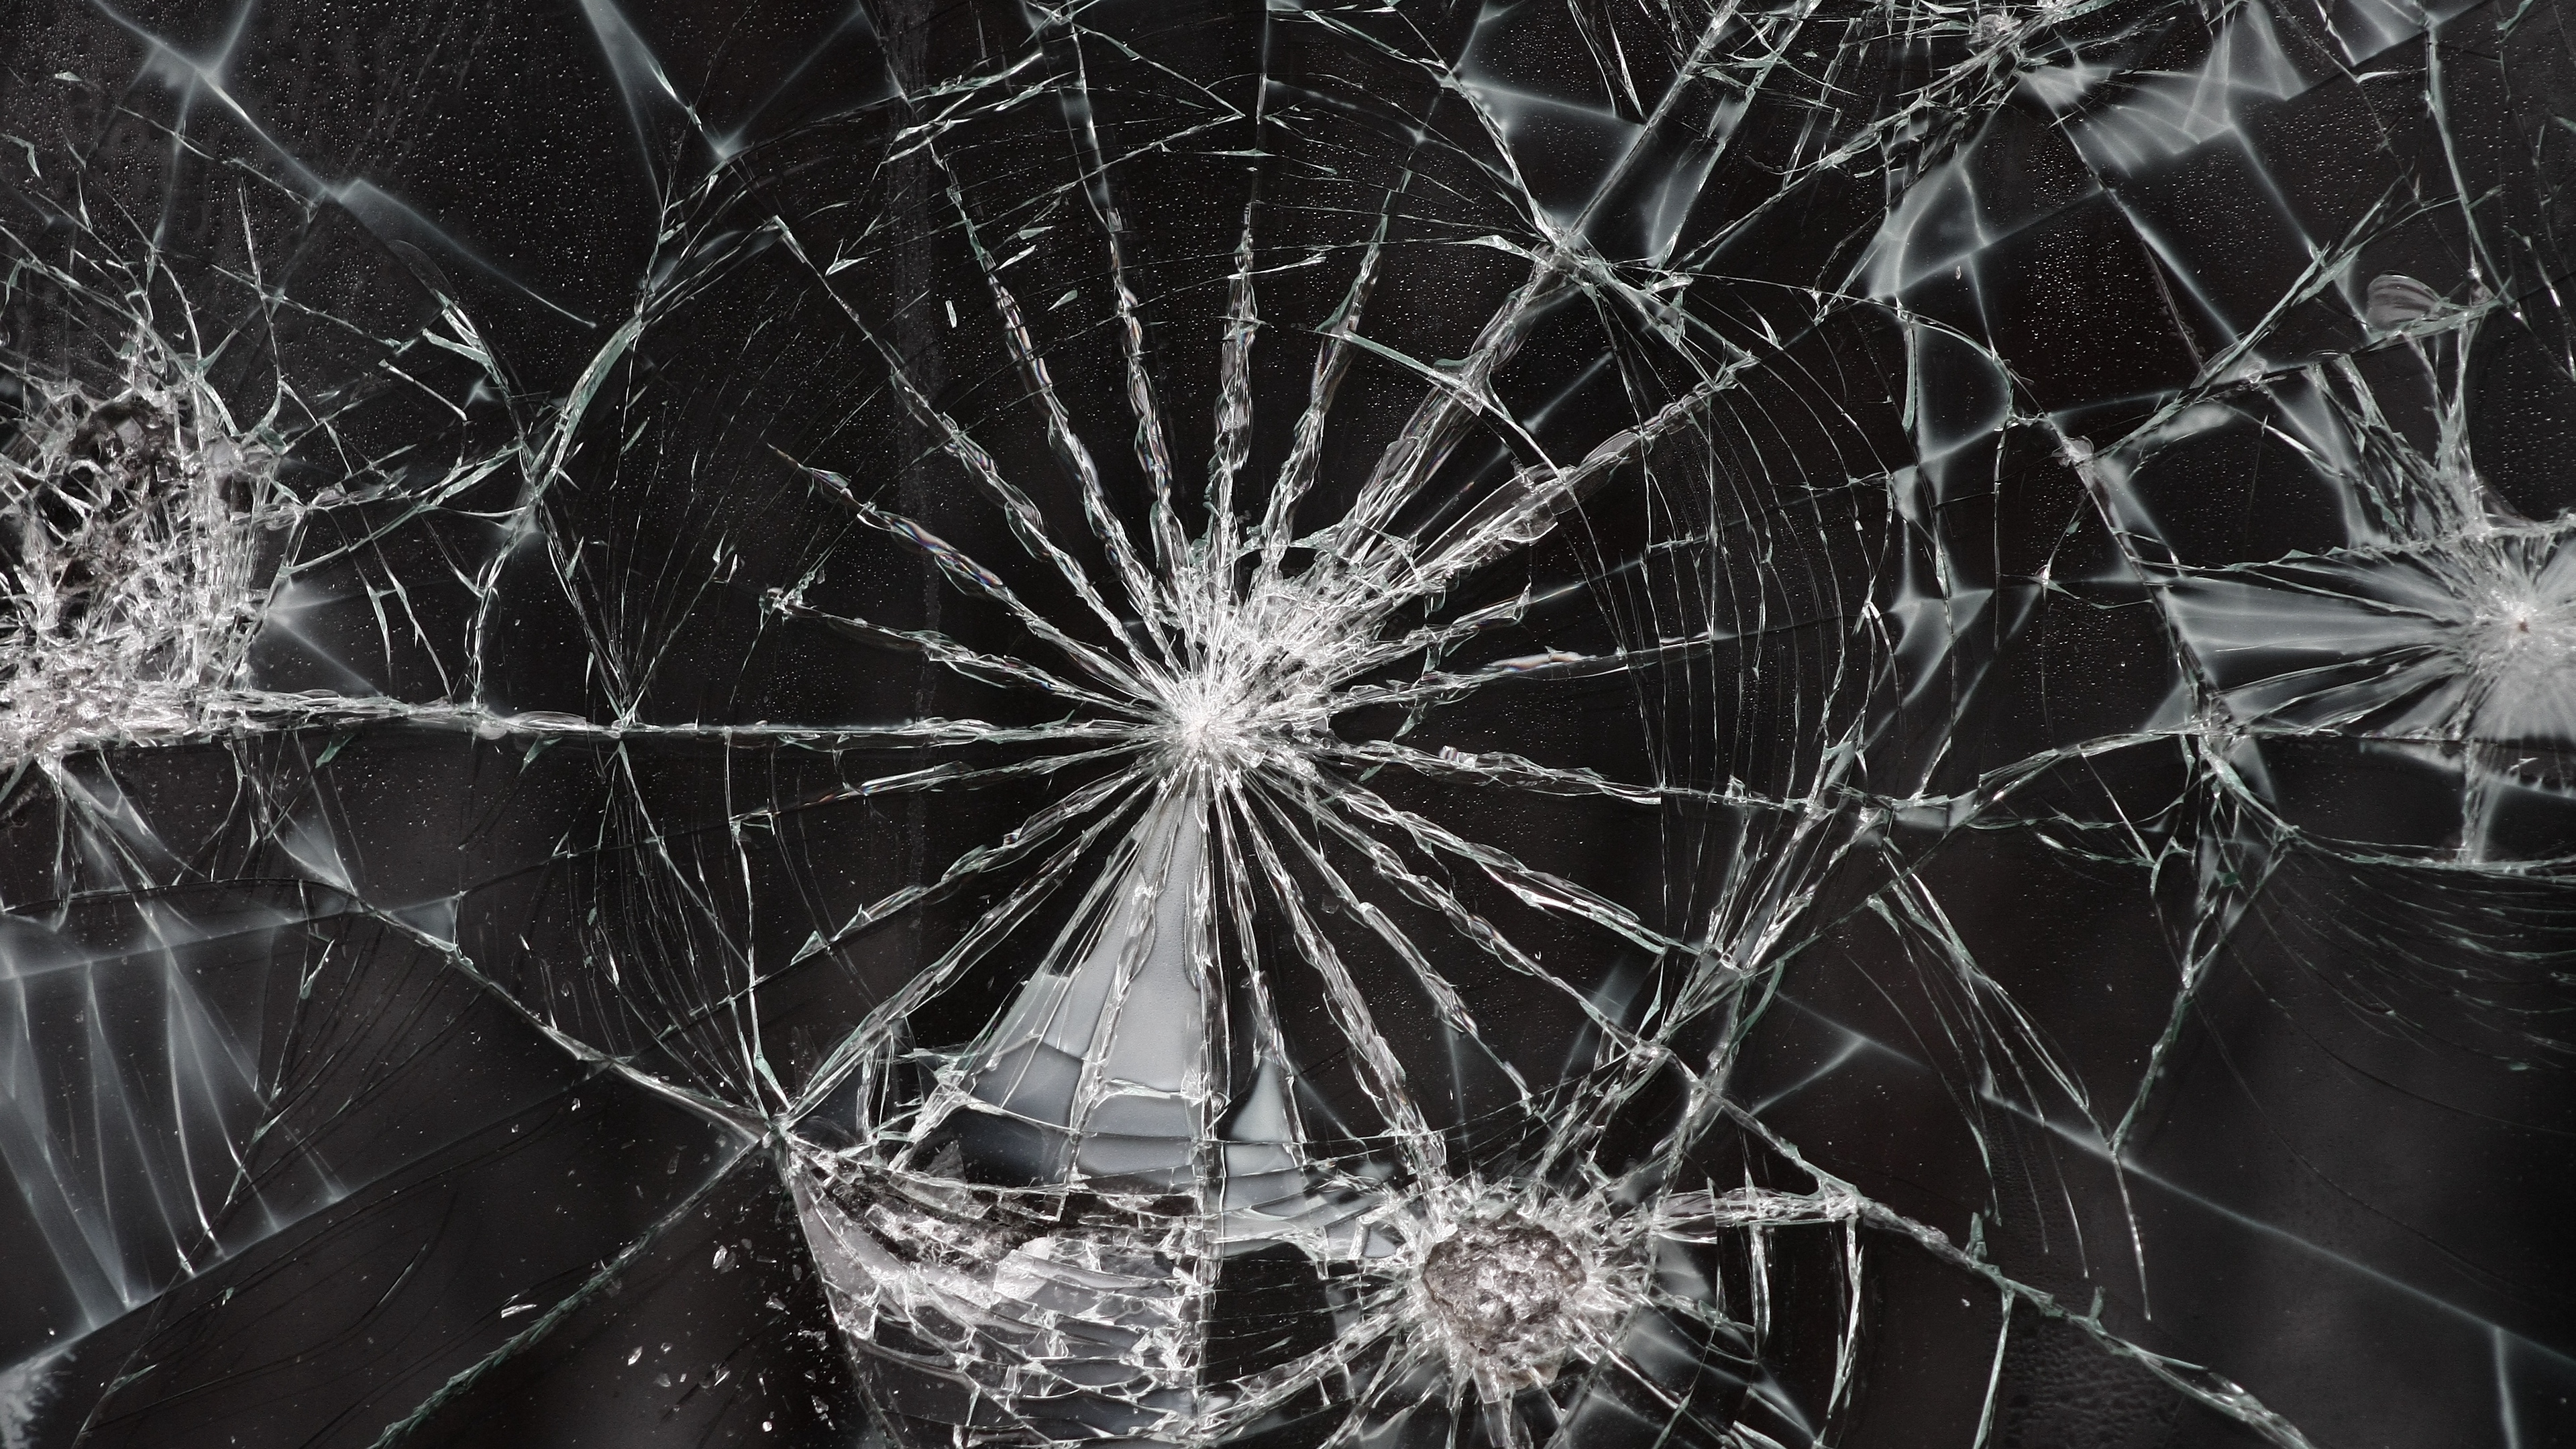 cracks texture surface 4k 1536097894 - cracks, texture, surface 4k - Texture, Surface, cracks